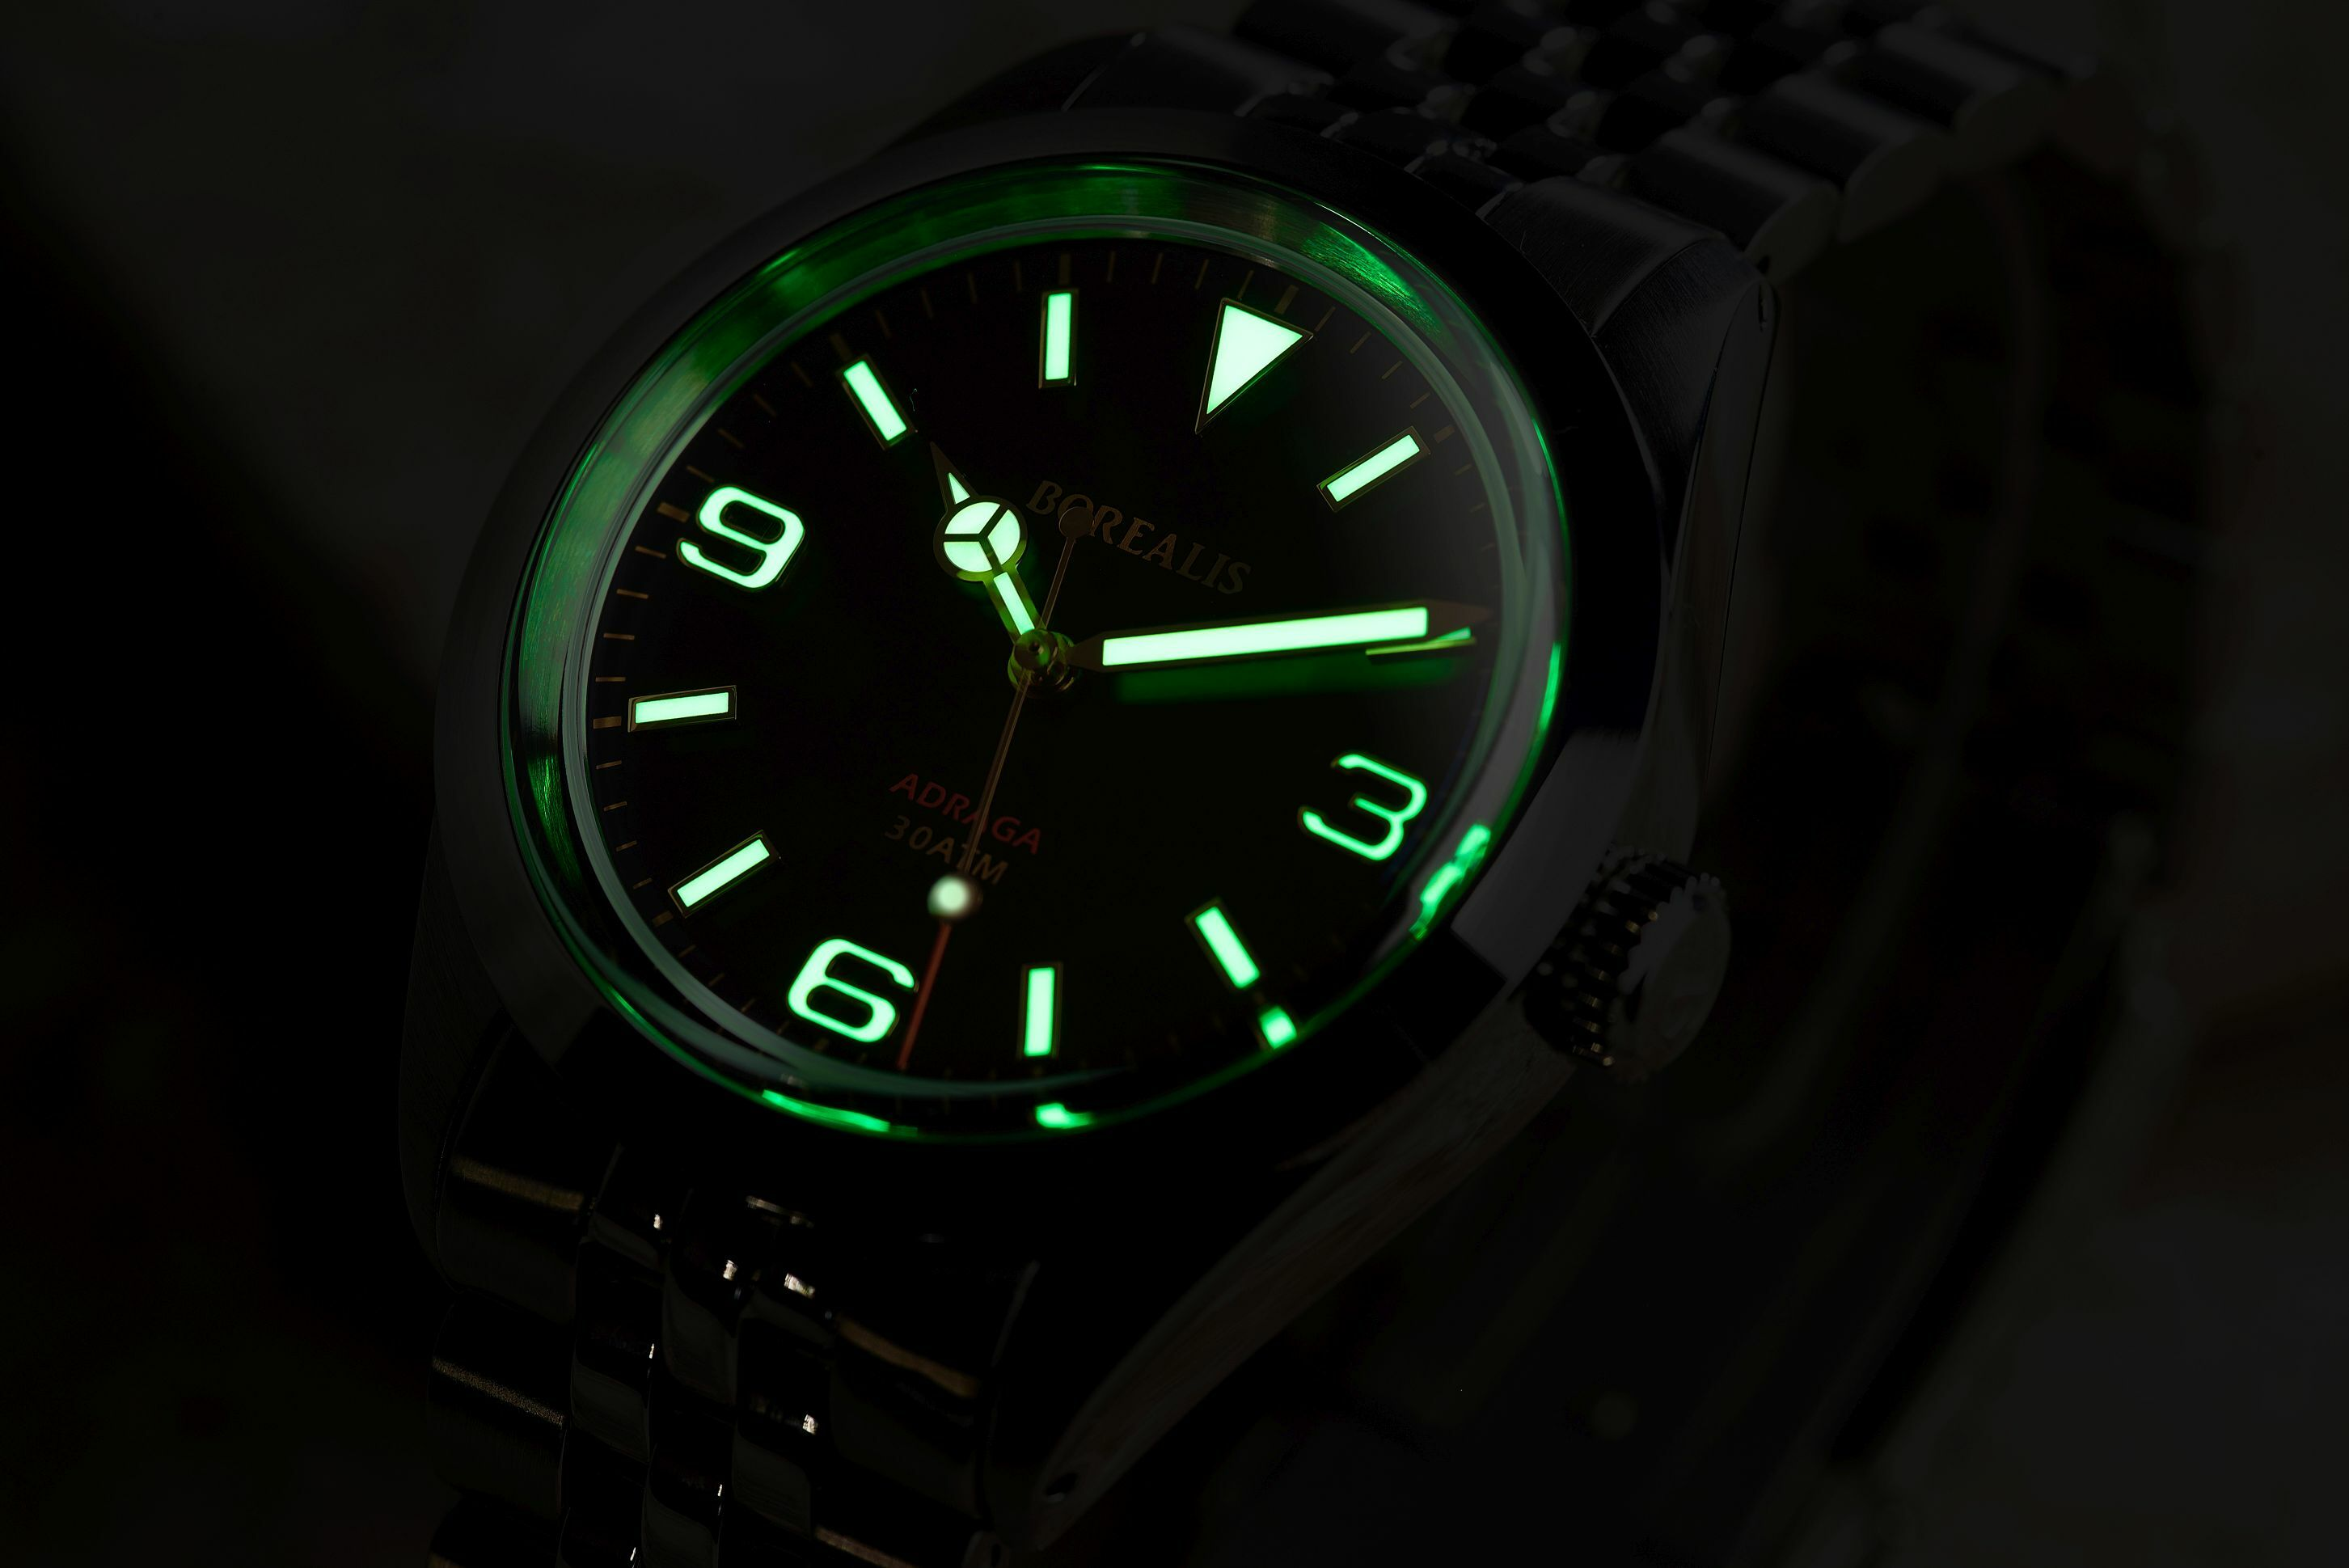 Borealis Adraga Stainless Steel Miyota 9015 black dial Mercedes Hands No Date Old Radium X1 lume